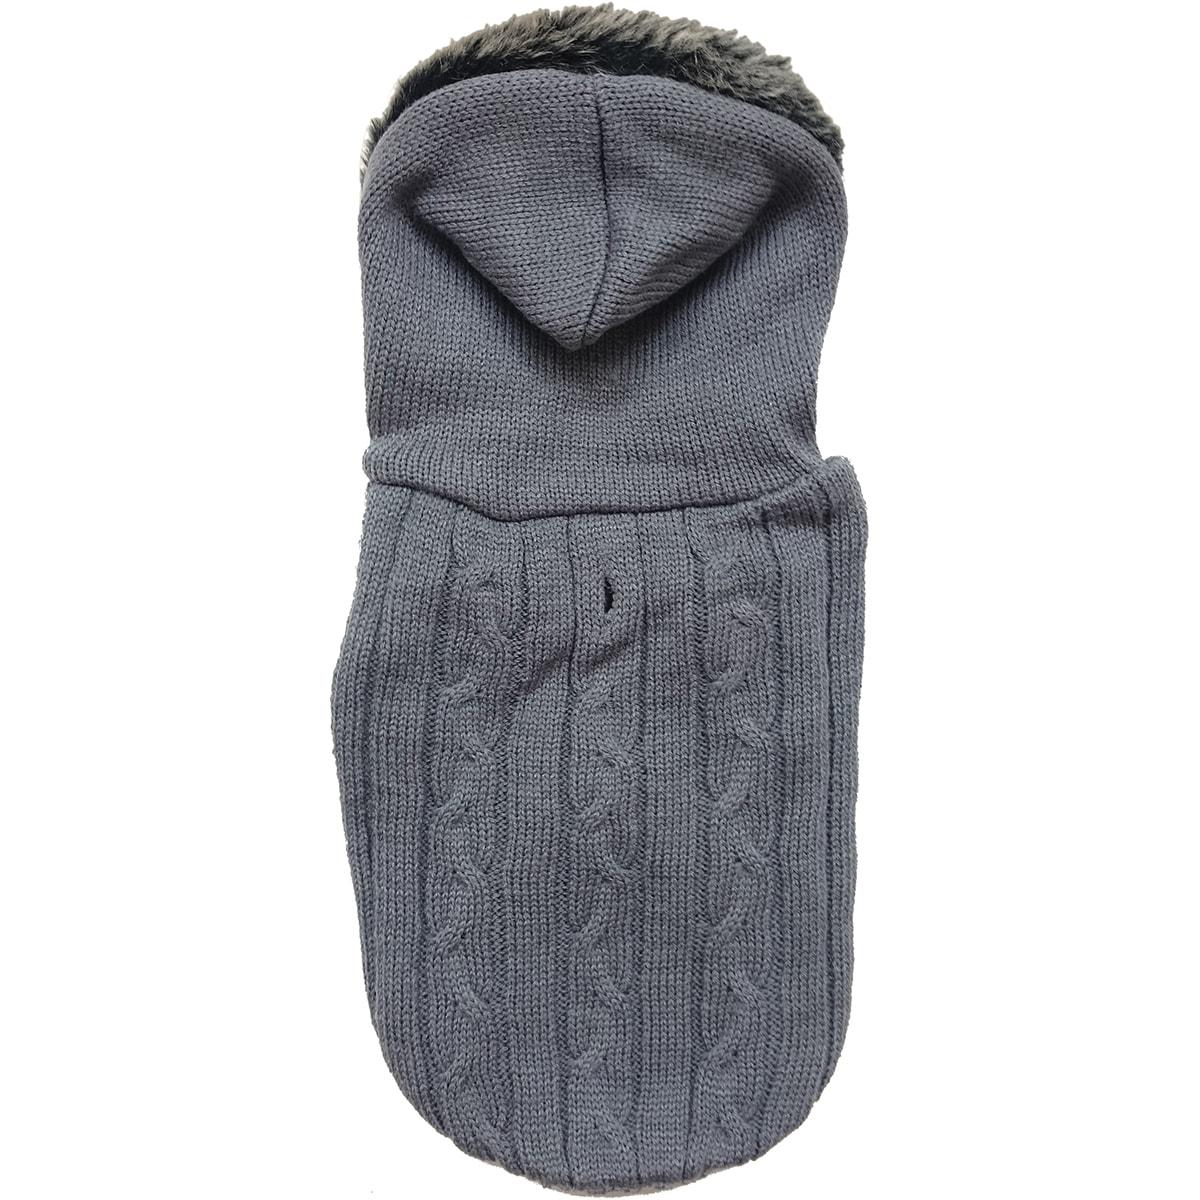 Ethical Pets Fashion Pet Faux Fur Hooded Sweater (Gray La...